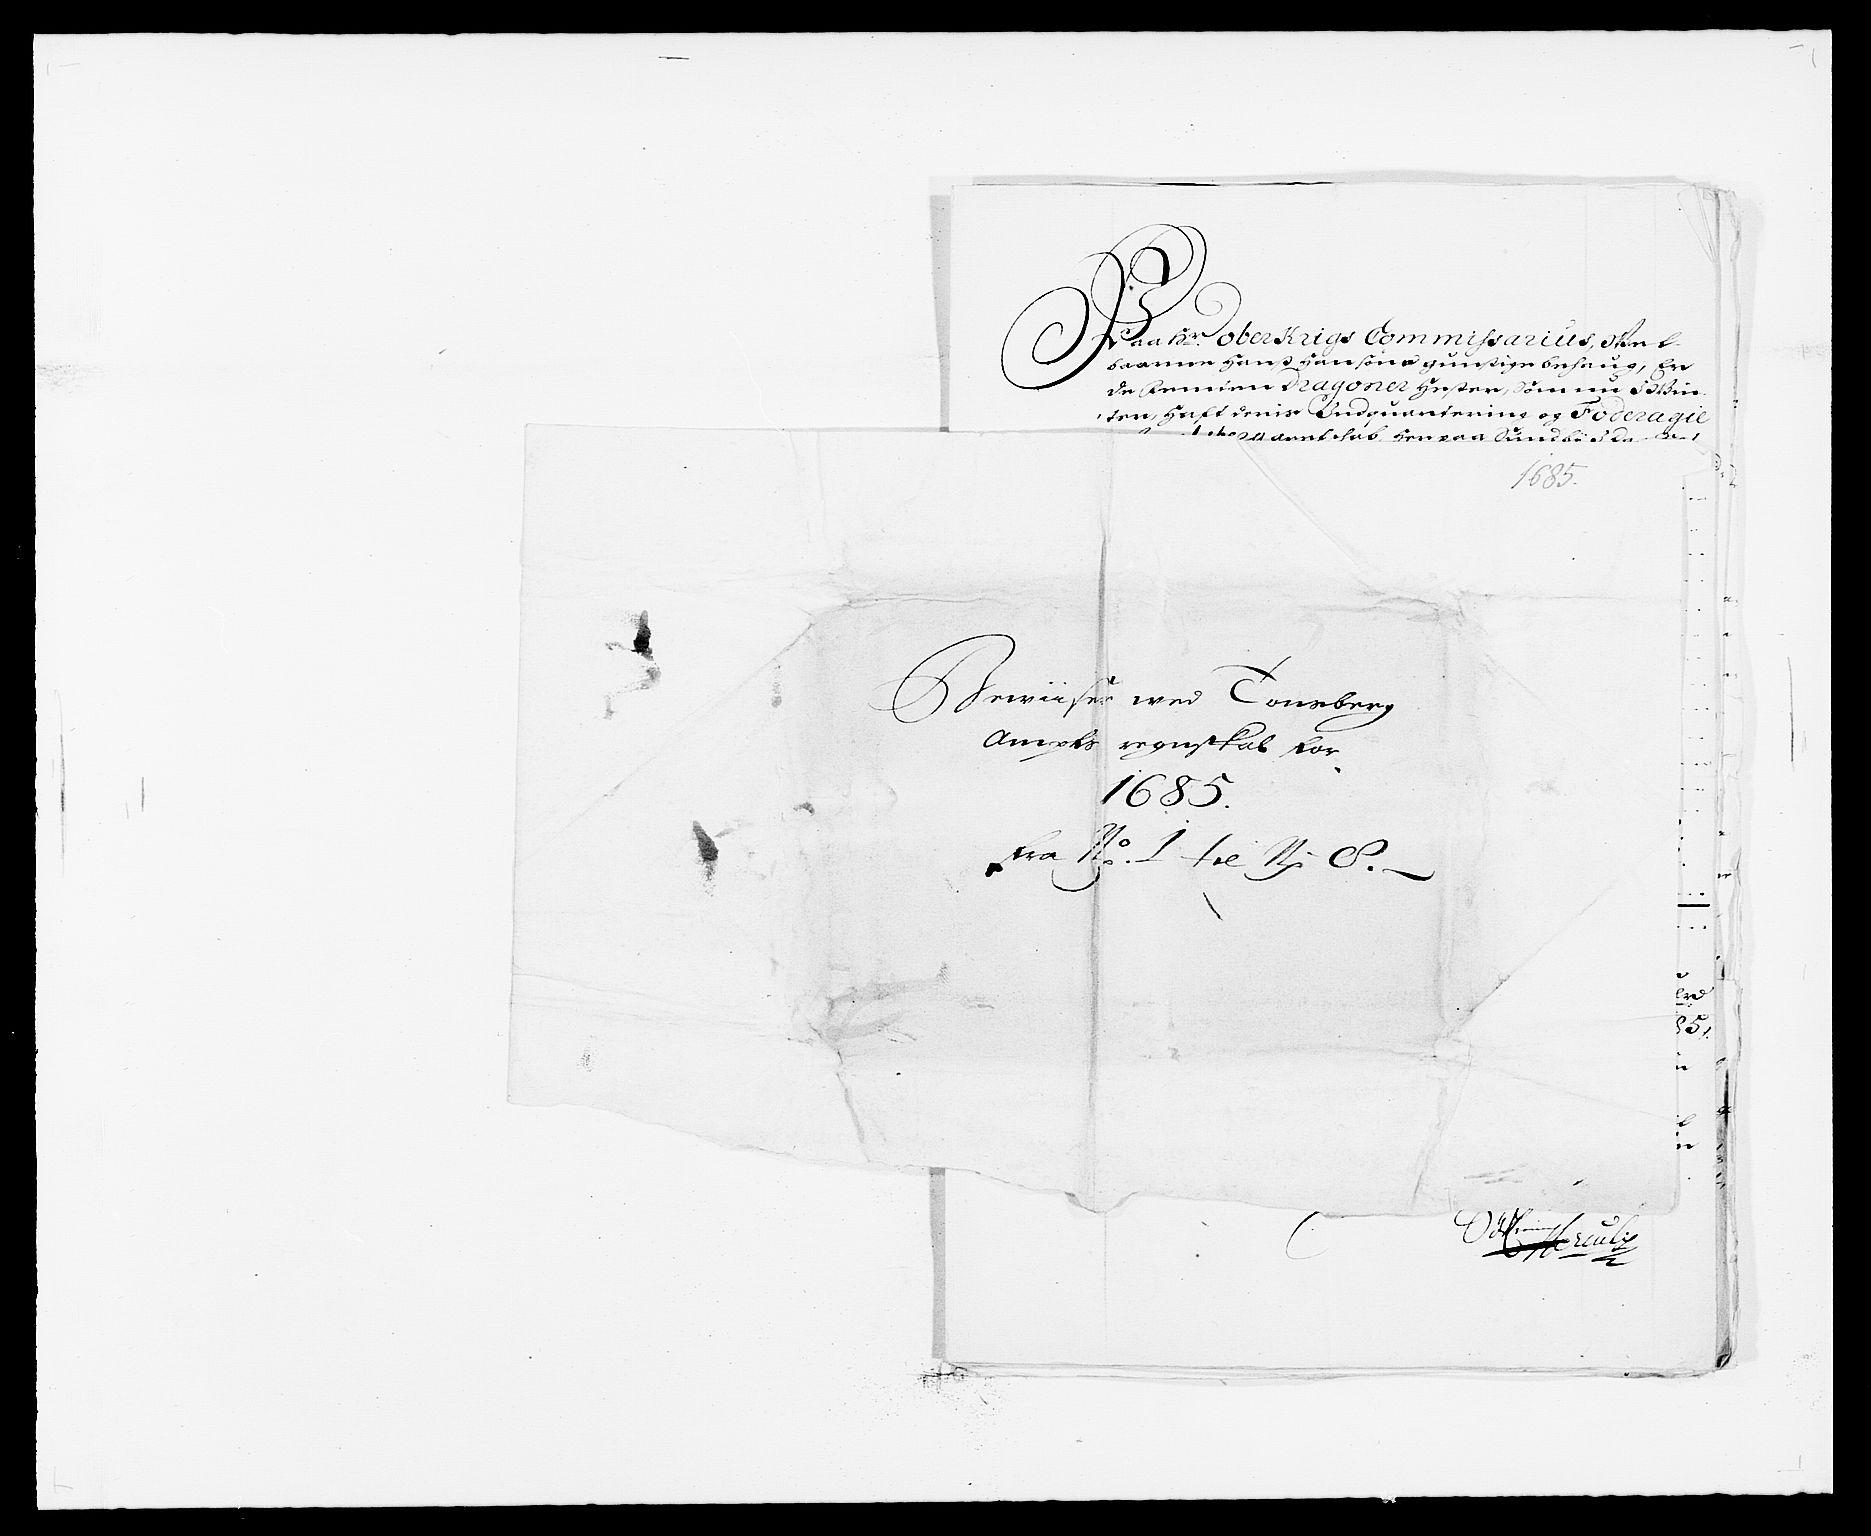 RA, Rentekammeret inntil 1814, Reviderte regnskaper, Fogderegnskap, R32/L1856: Fogderegnskap Jarlsberg grevskap, 1685, s. 358